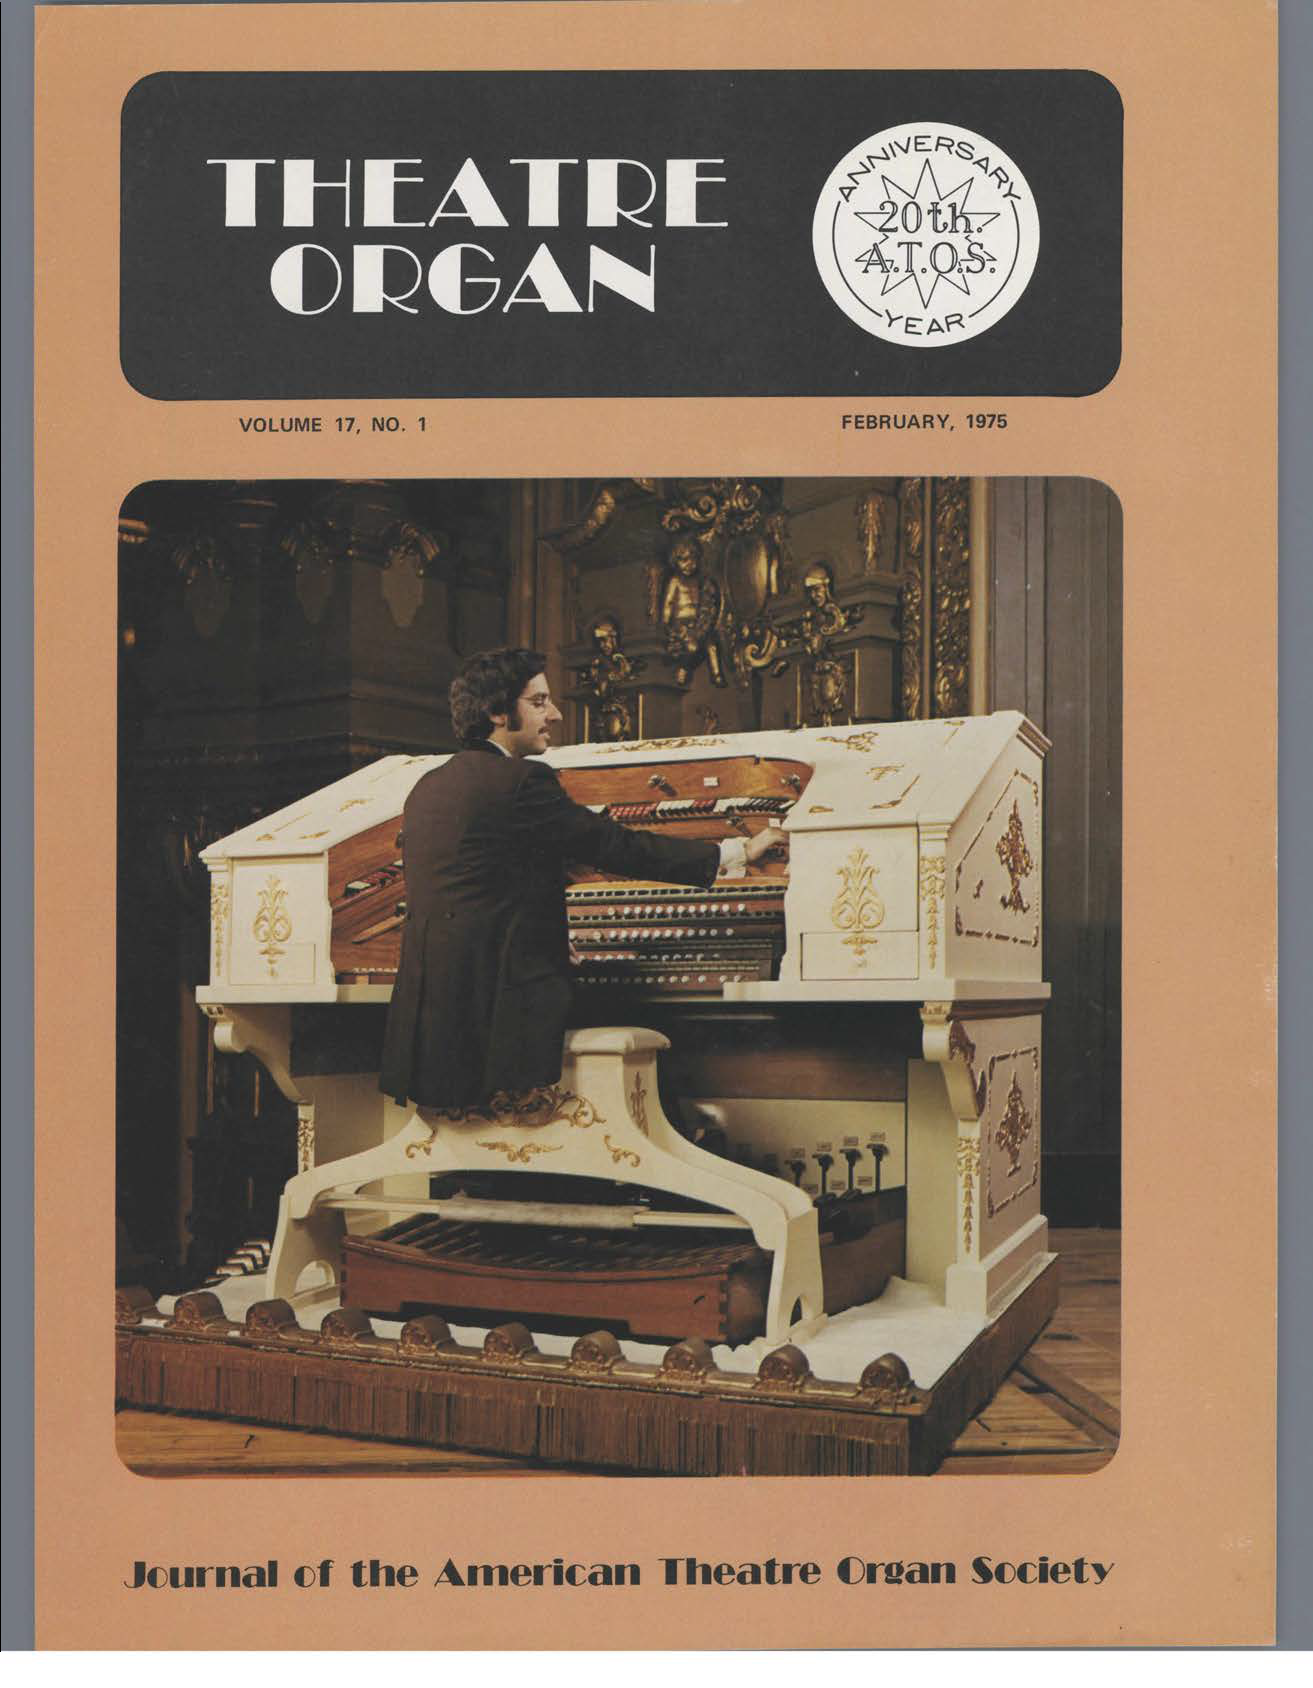 Theatre Organ, February 1975, Volume 17, Number 1